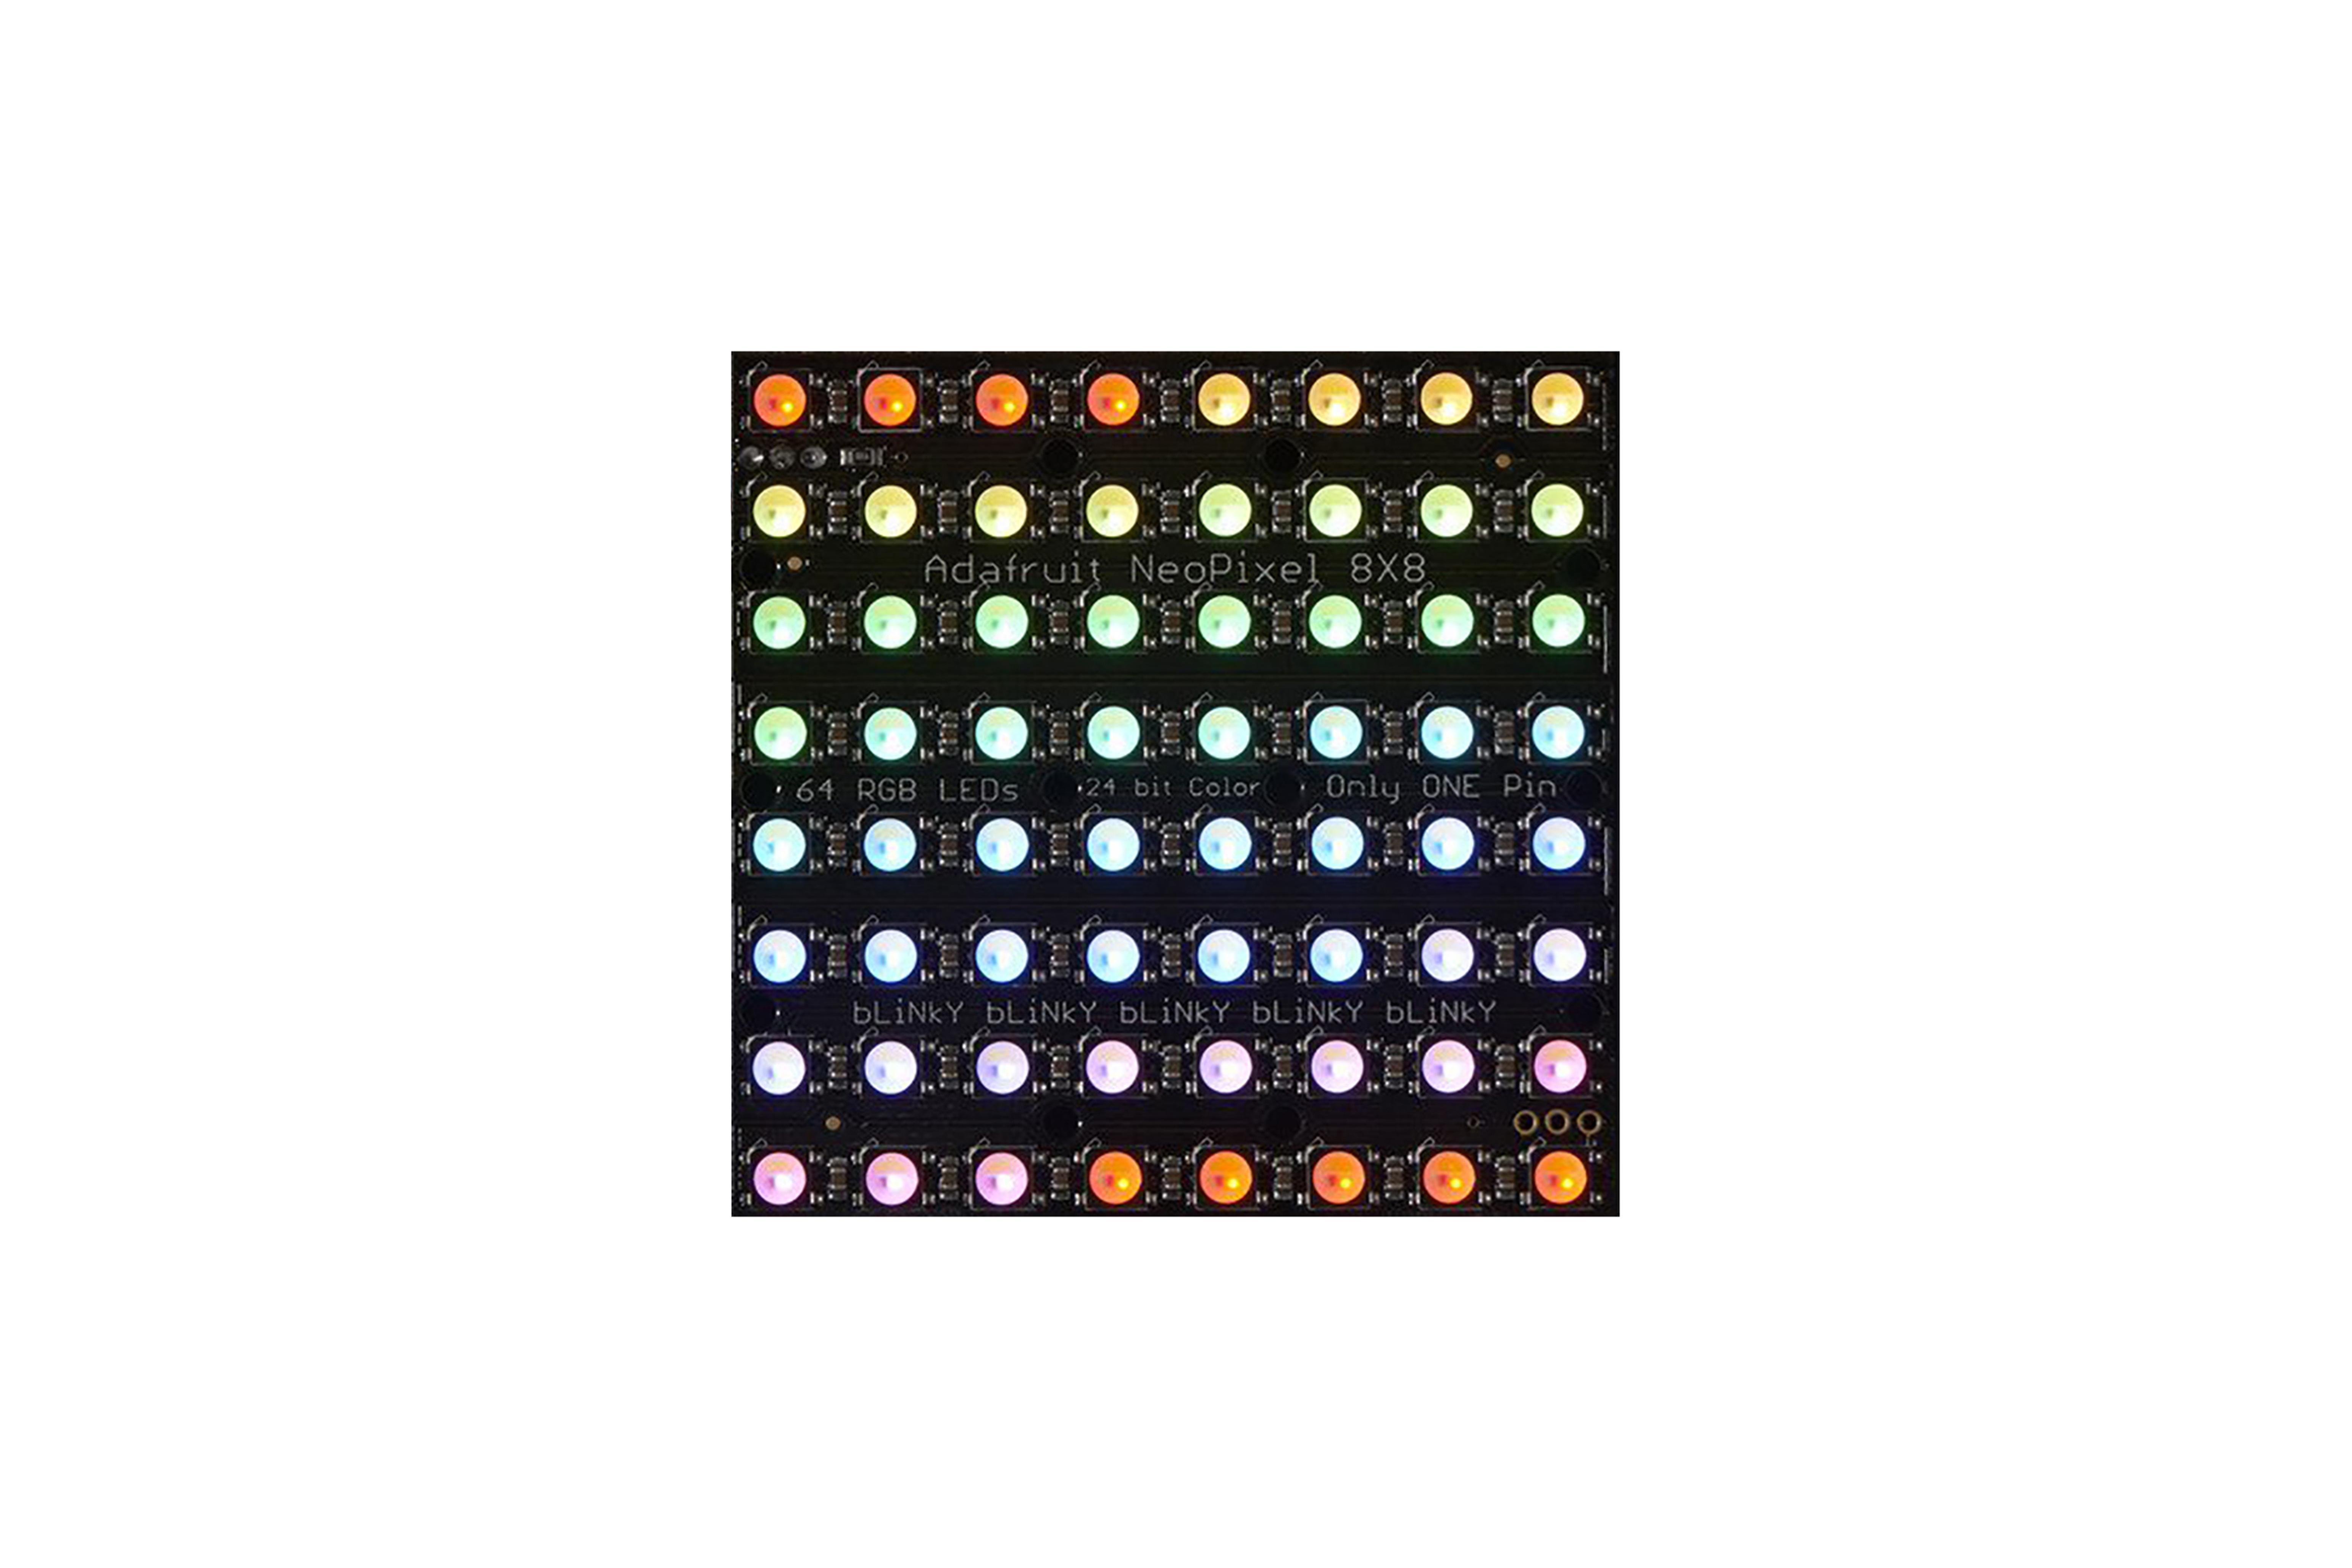 NEOPIXEL NEOMATRIX 64 RGBW LED 3000 K